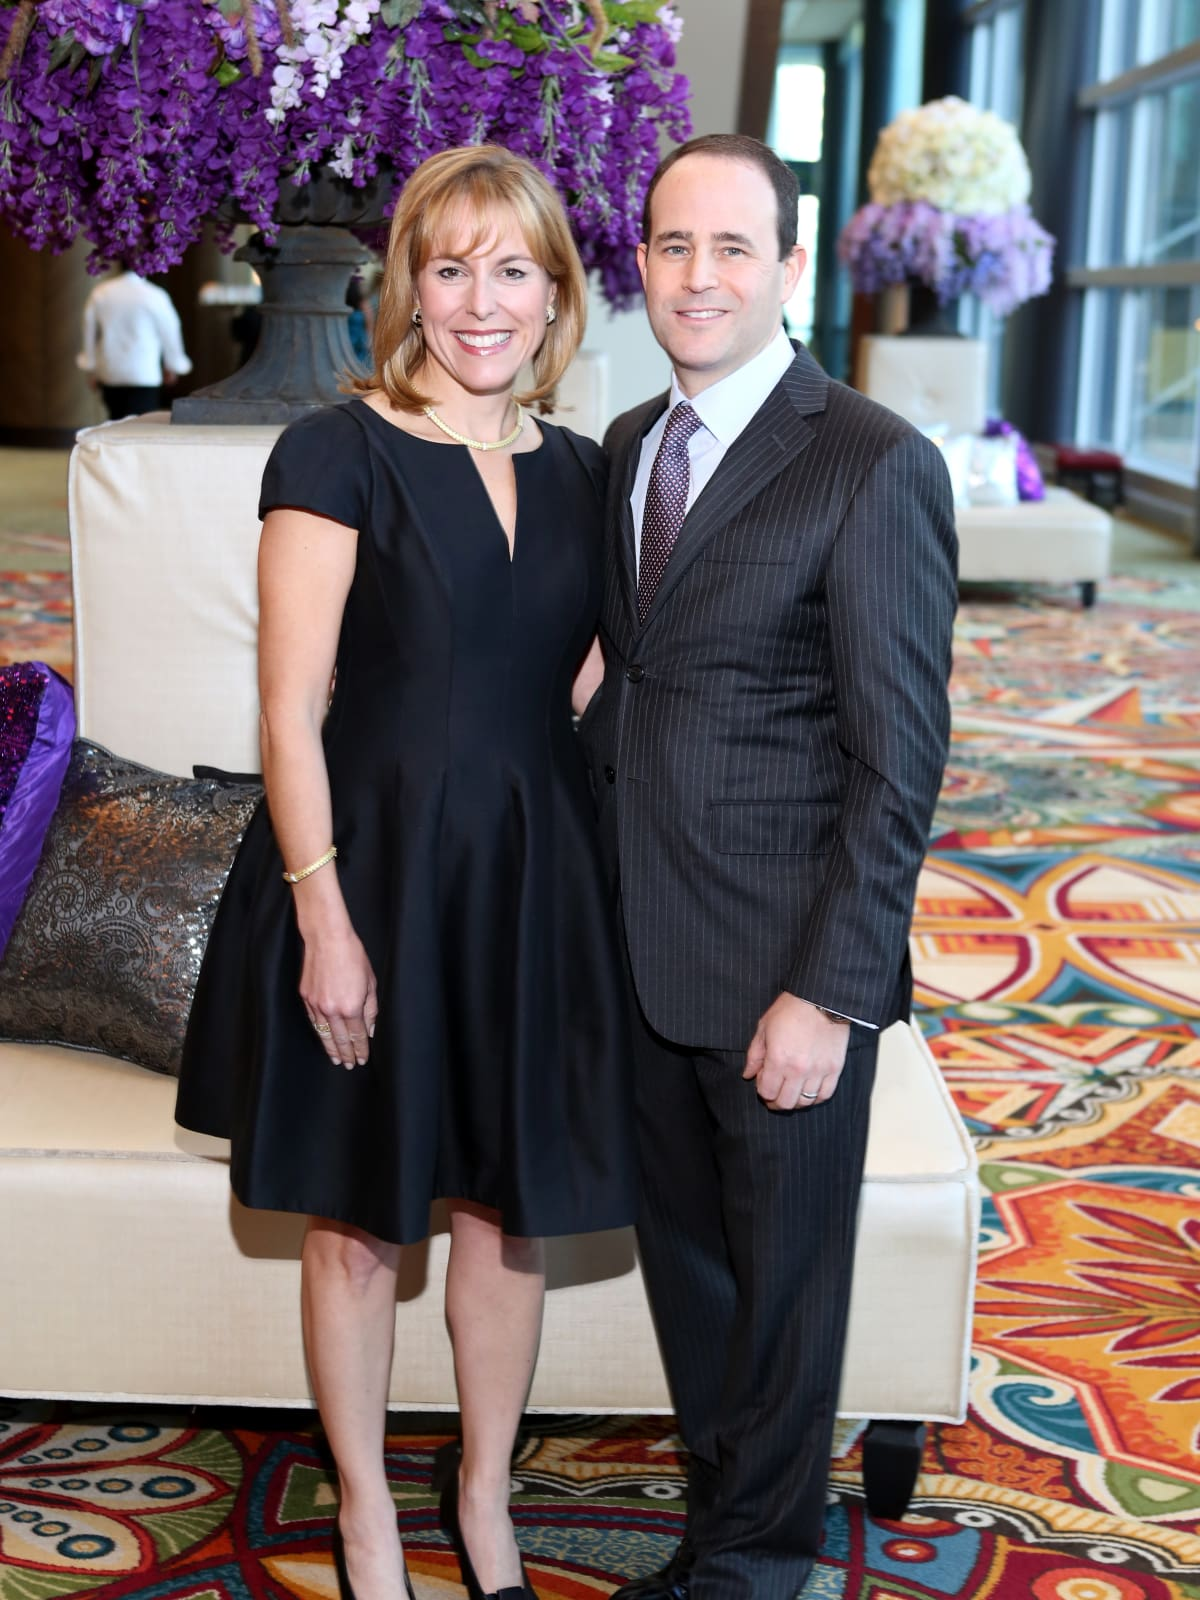 News, Shelby, March of Dimes Signature chefs, Nov. 2015, Debbie Sukin, Steve Sukin